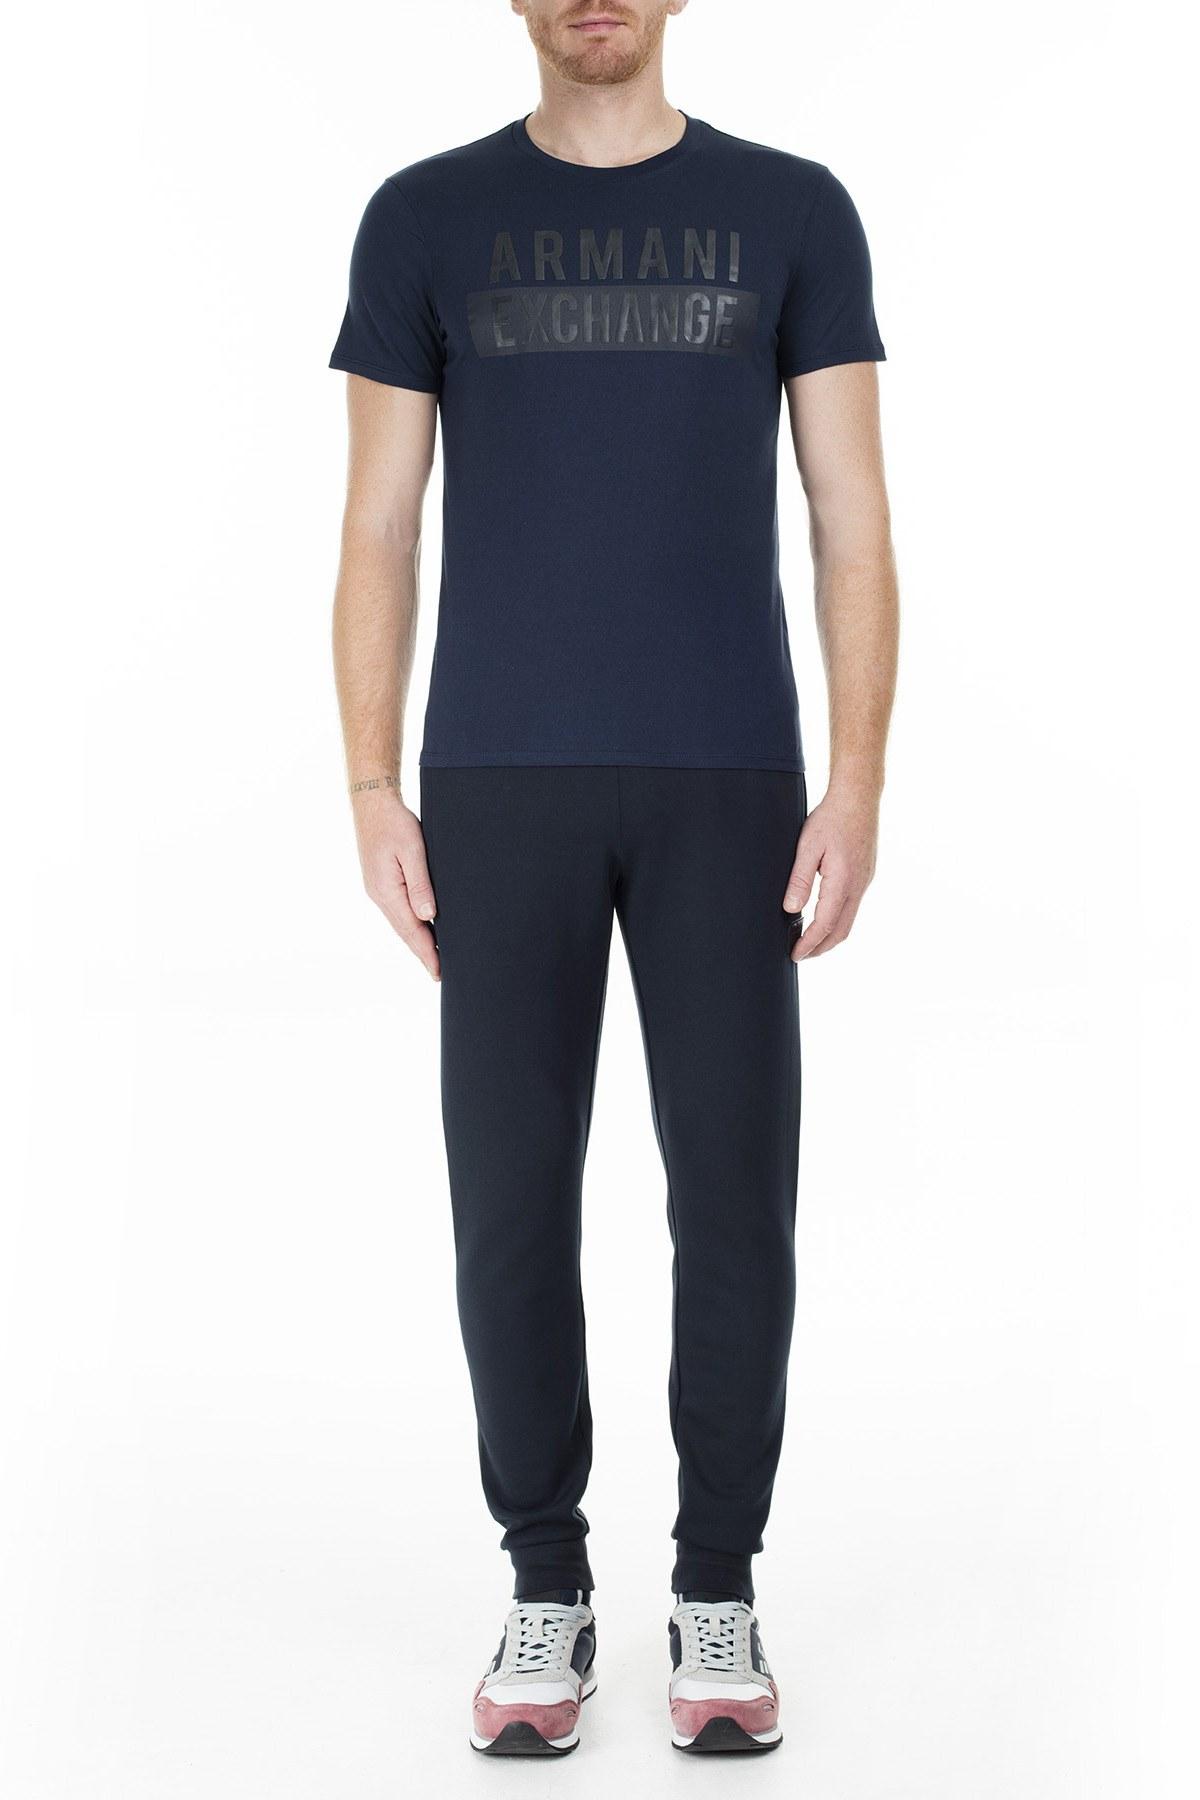 Armani Exchange Erkek T Shirt 6GZTBS ZJV5Z 1510 LACİVERT